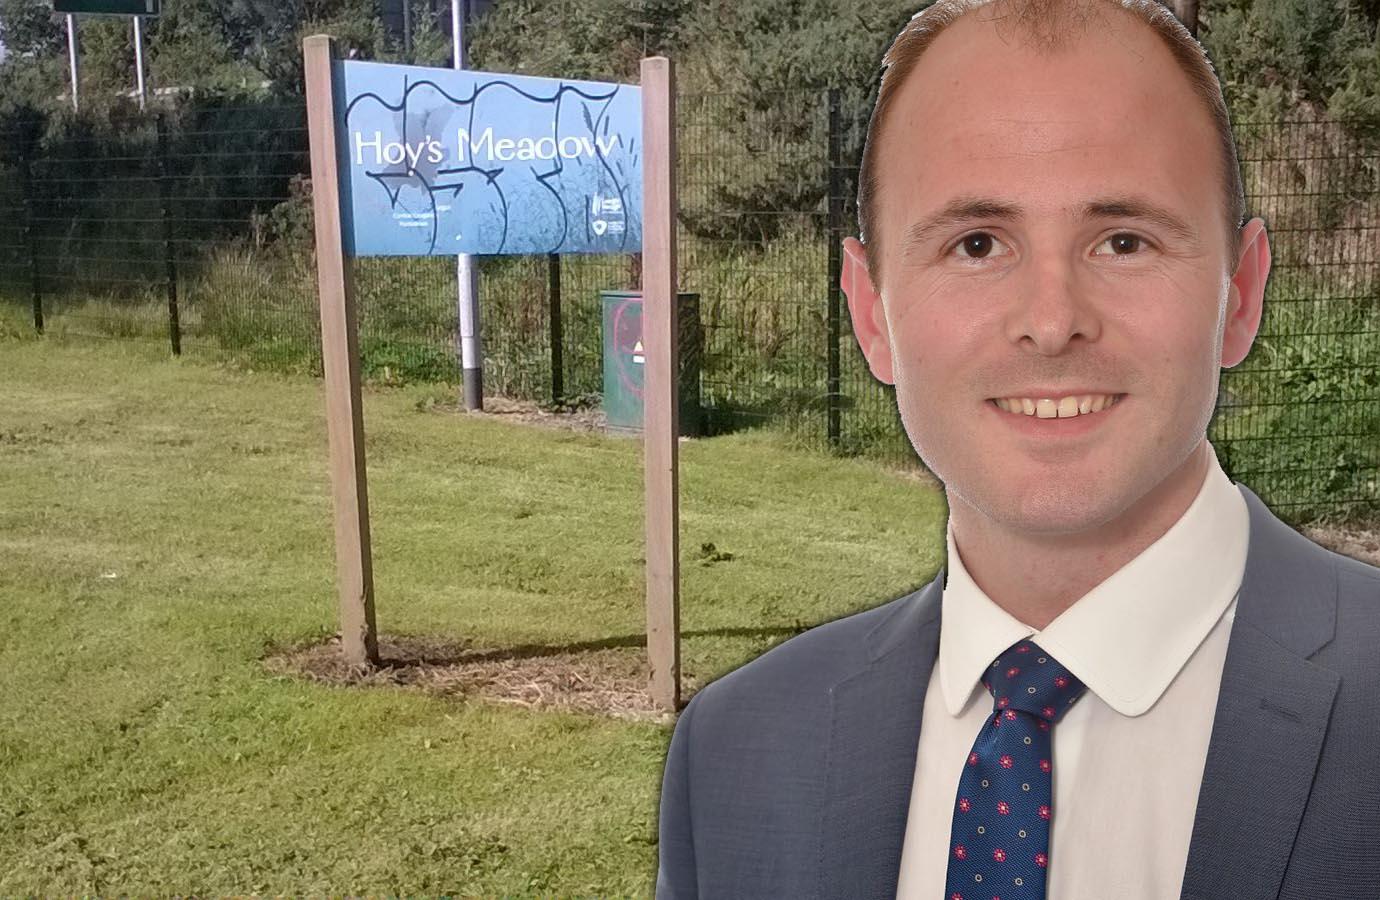 Hoy's Meadow Portadown councillor Darryn causby